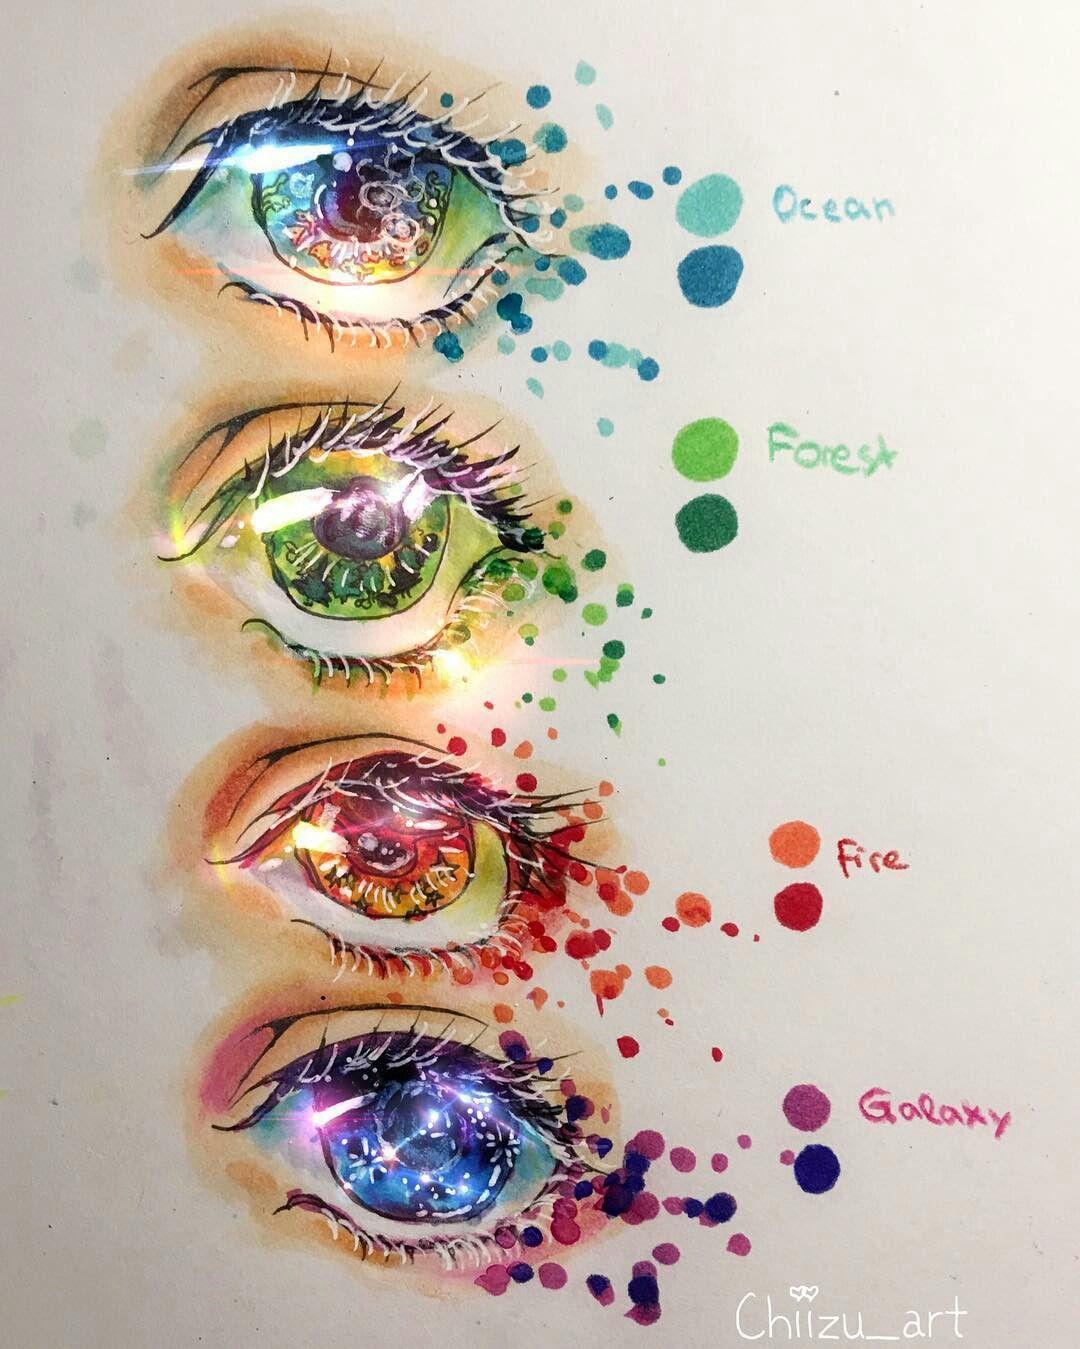 Pin By Zera On Art And Tips Copic Marker Art Marker Art Eye Art